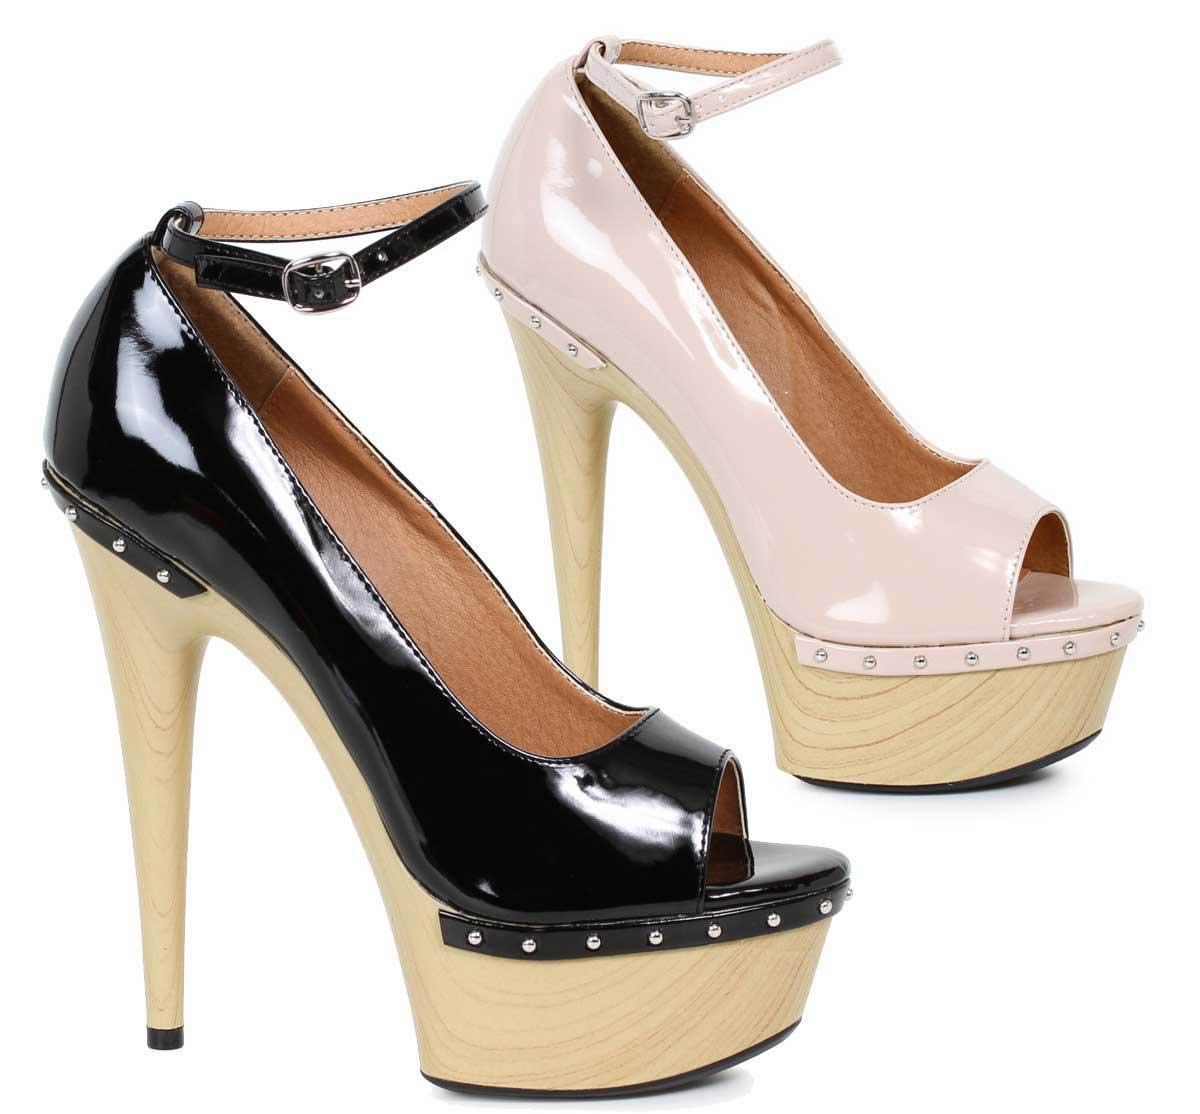 fbe6229c27f1 Ellie Shoes